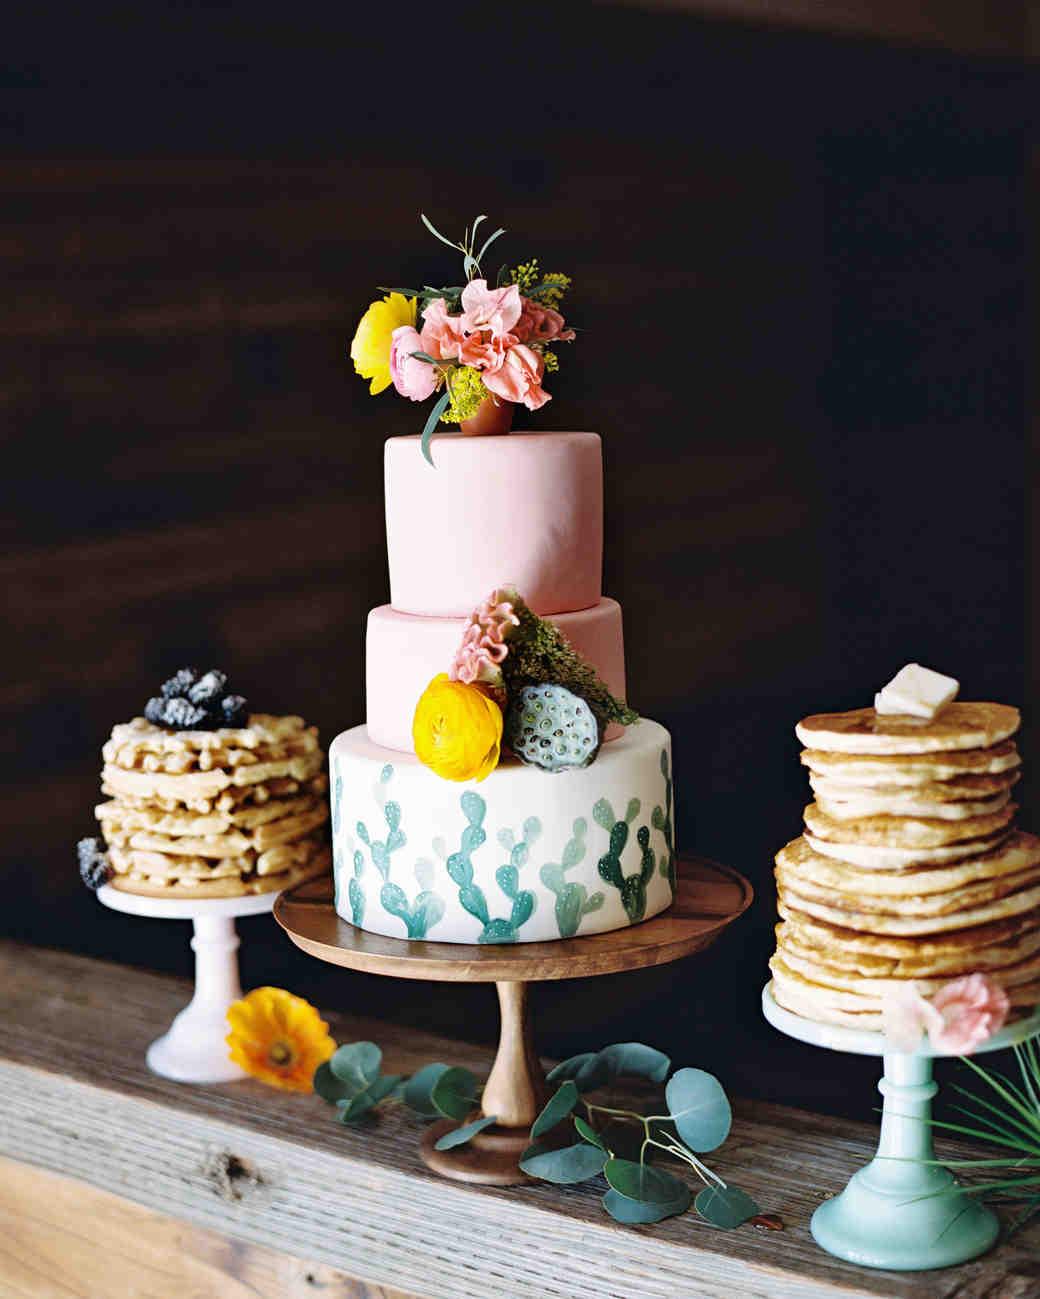 Wedding Cake Decorated with Cactus Motif